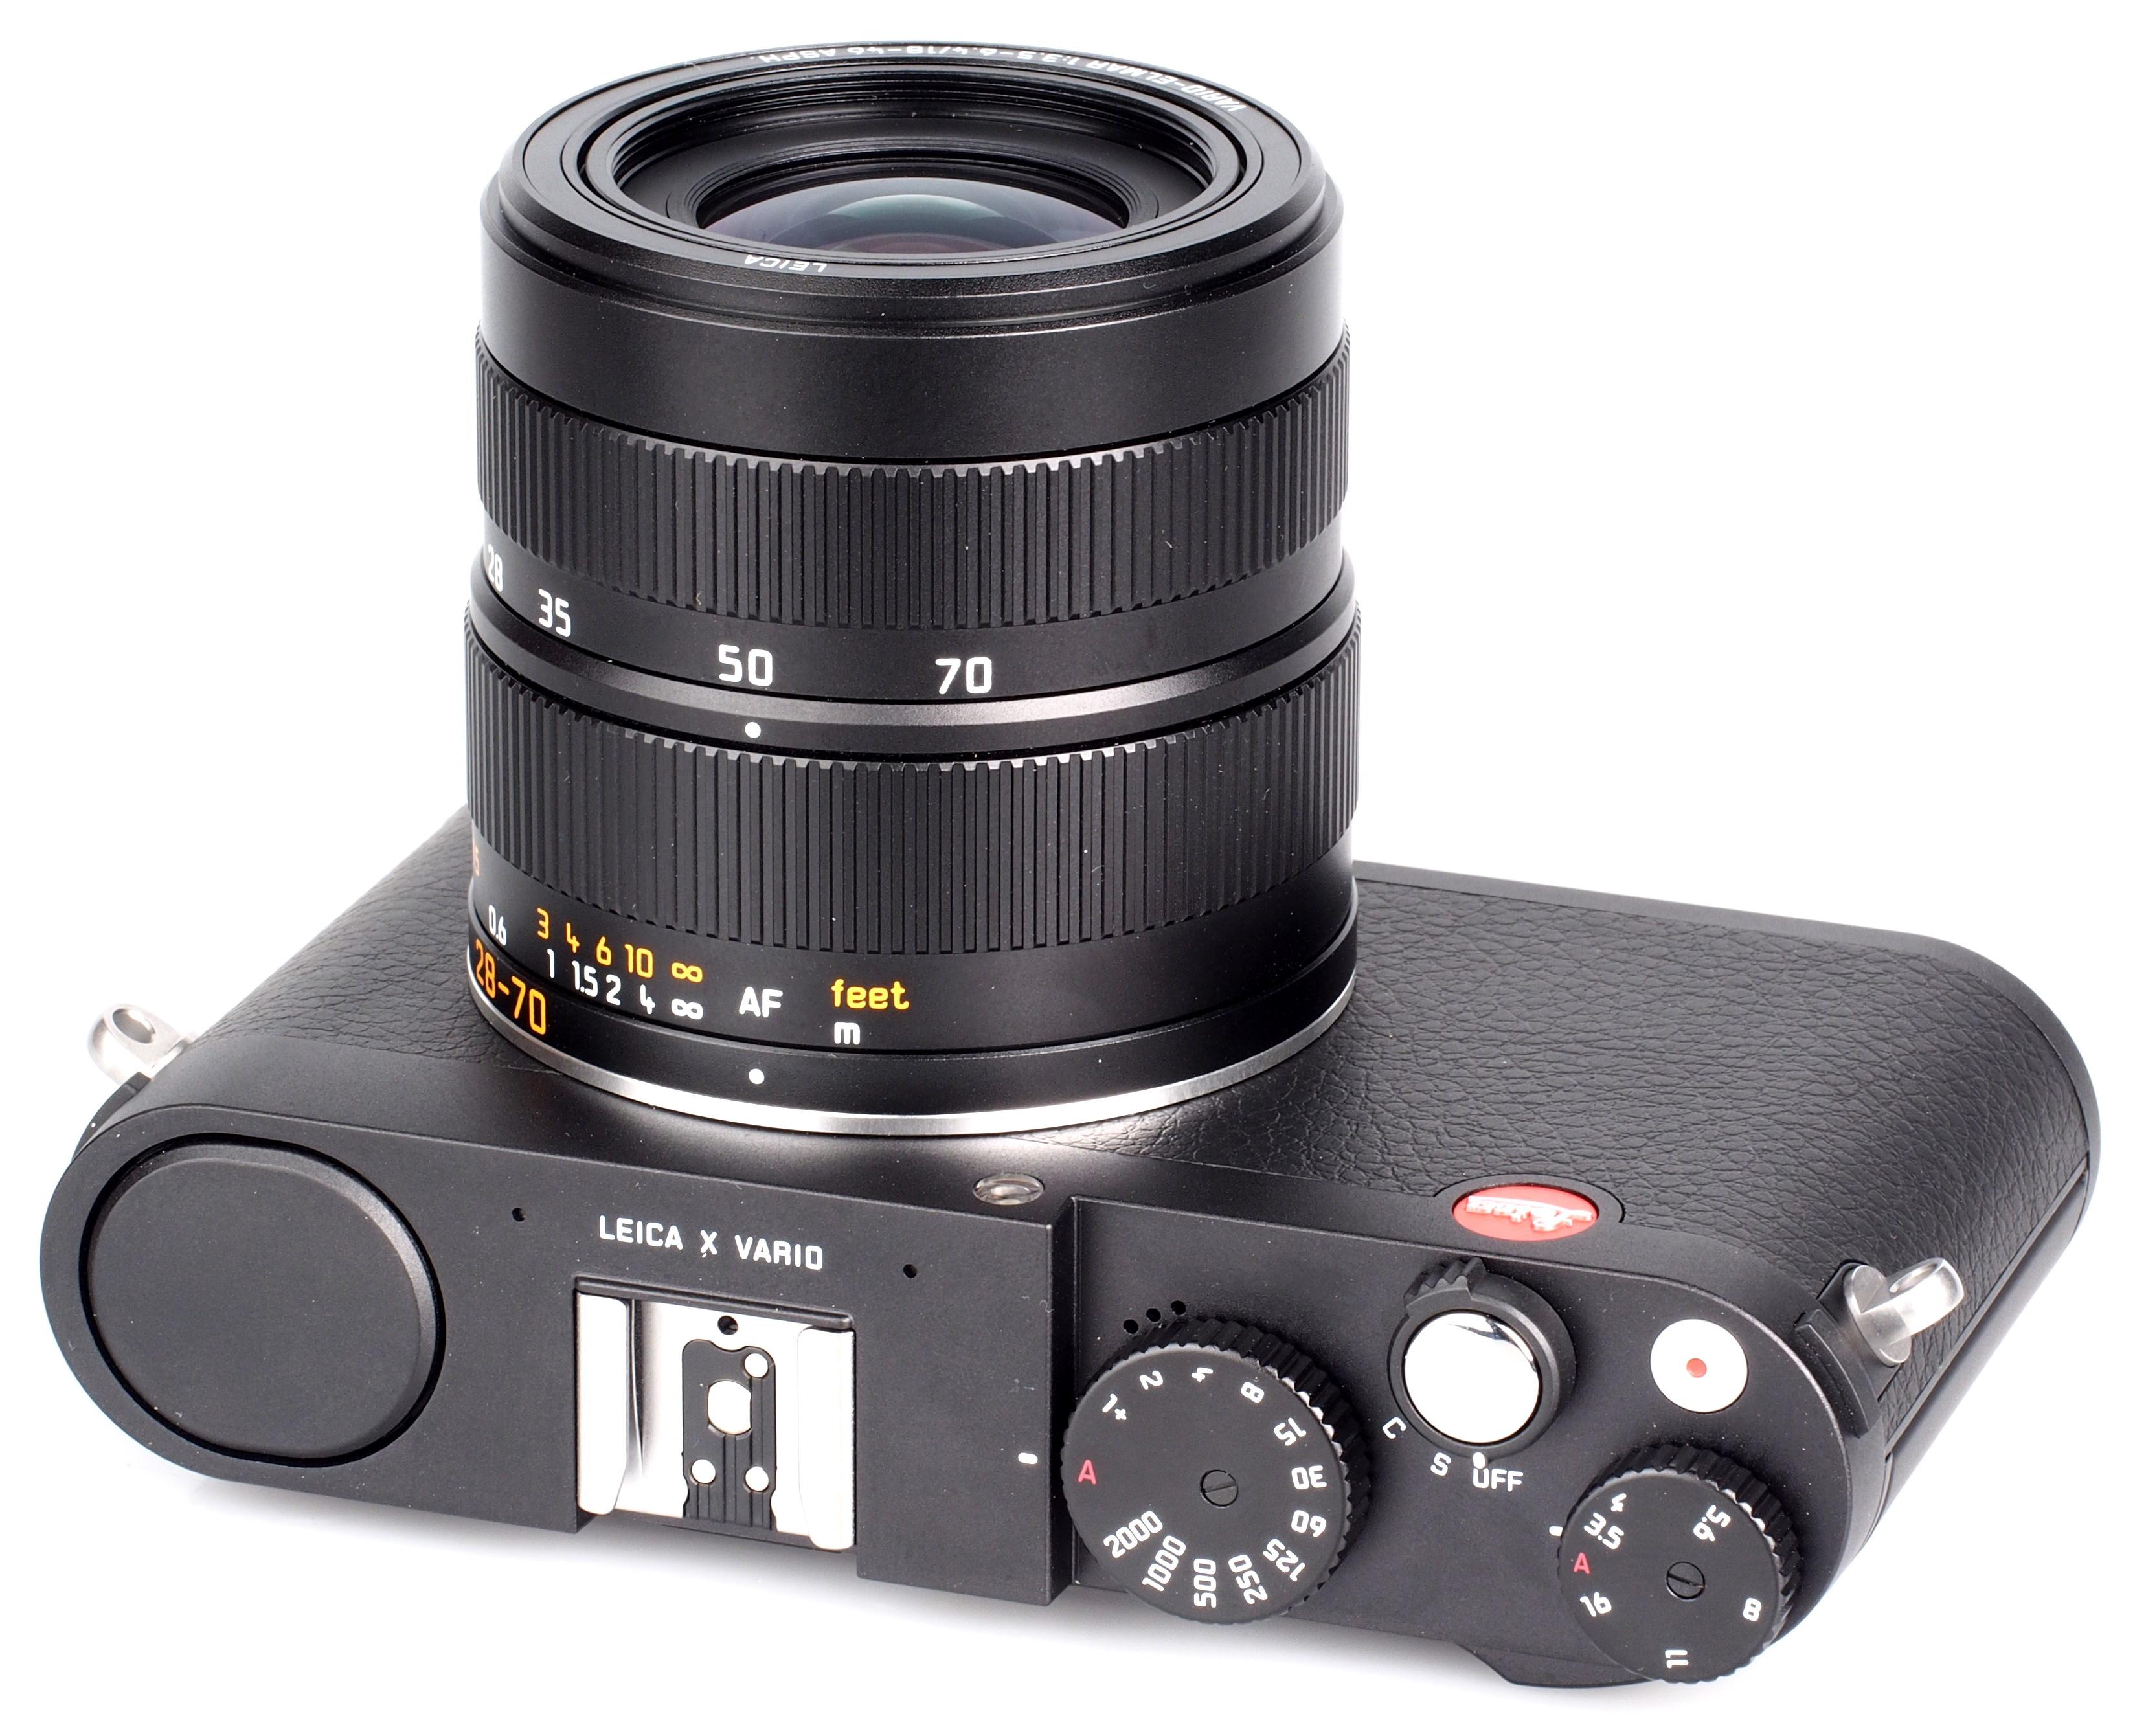 Leica X Vario Typ 107 Review